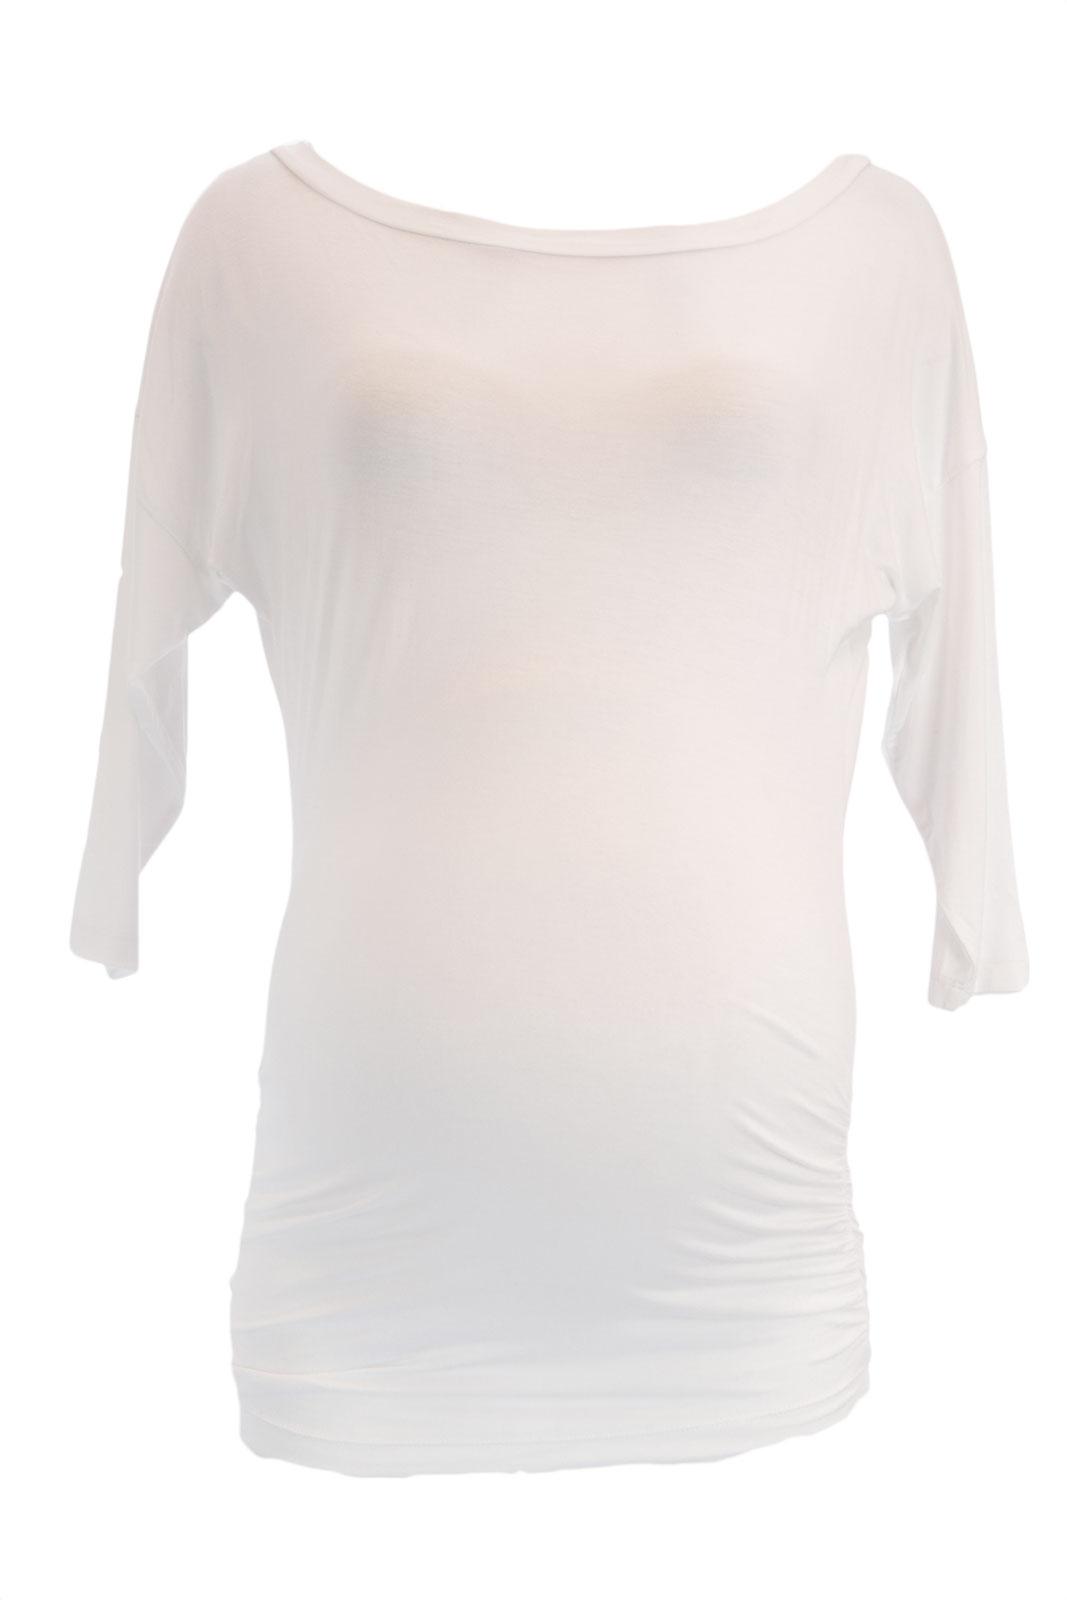 OLIAN Maternity Women's Solid 3/4 Dolman Sleeve Tunic Top X-Small White